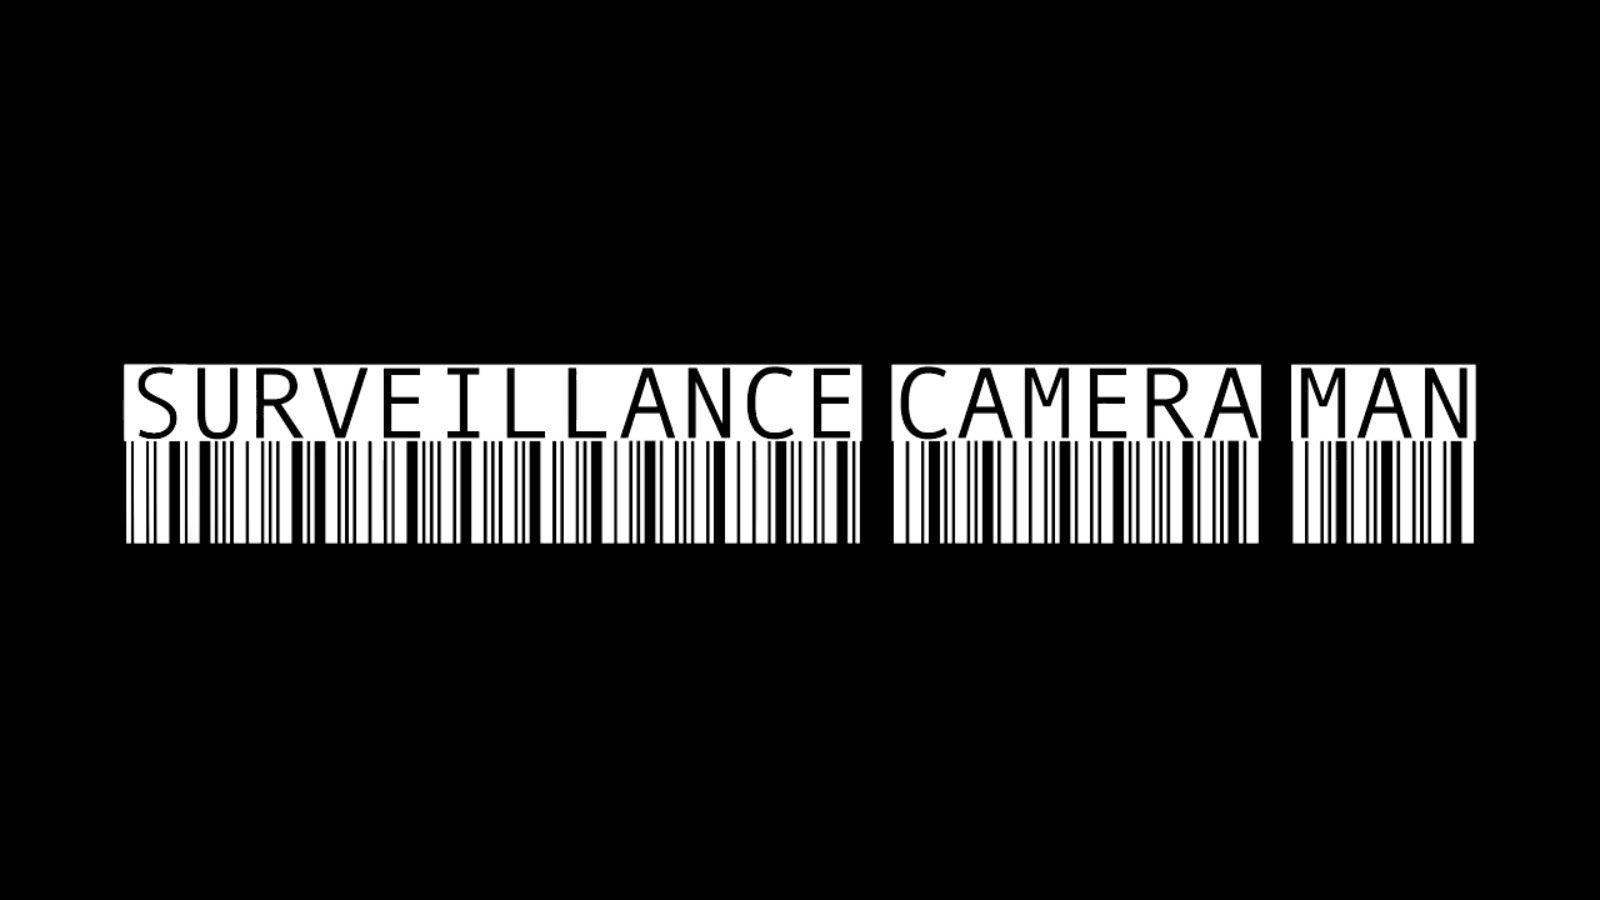 Surveillance Camera Man 1-8 | In flagrante delicto | Pinterest